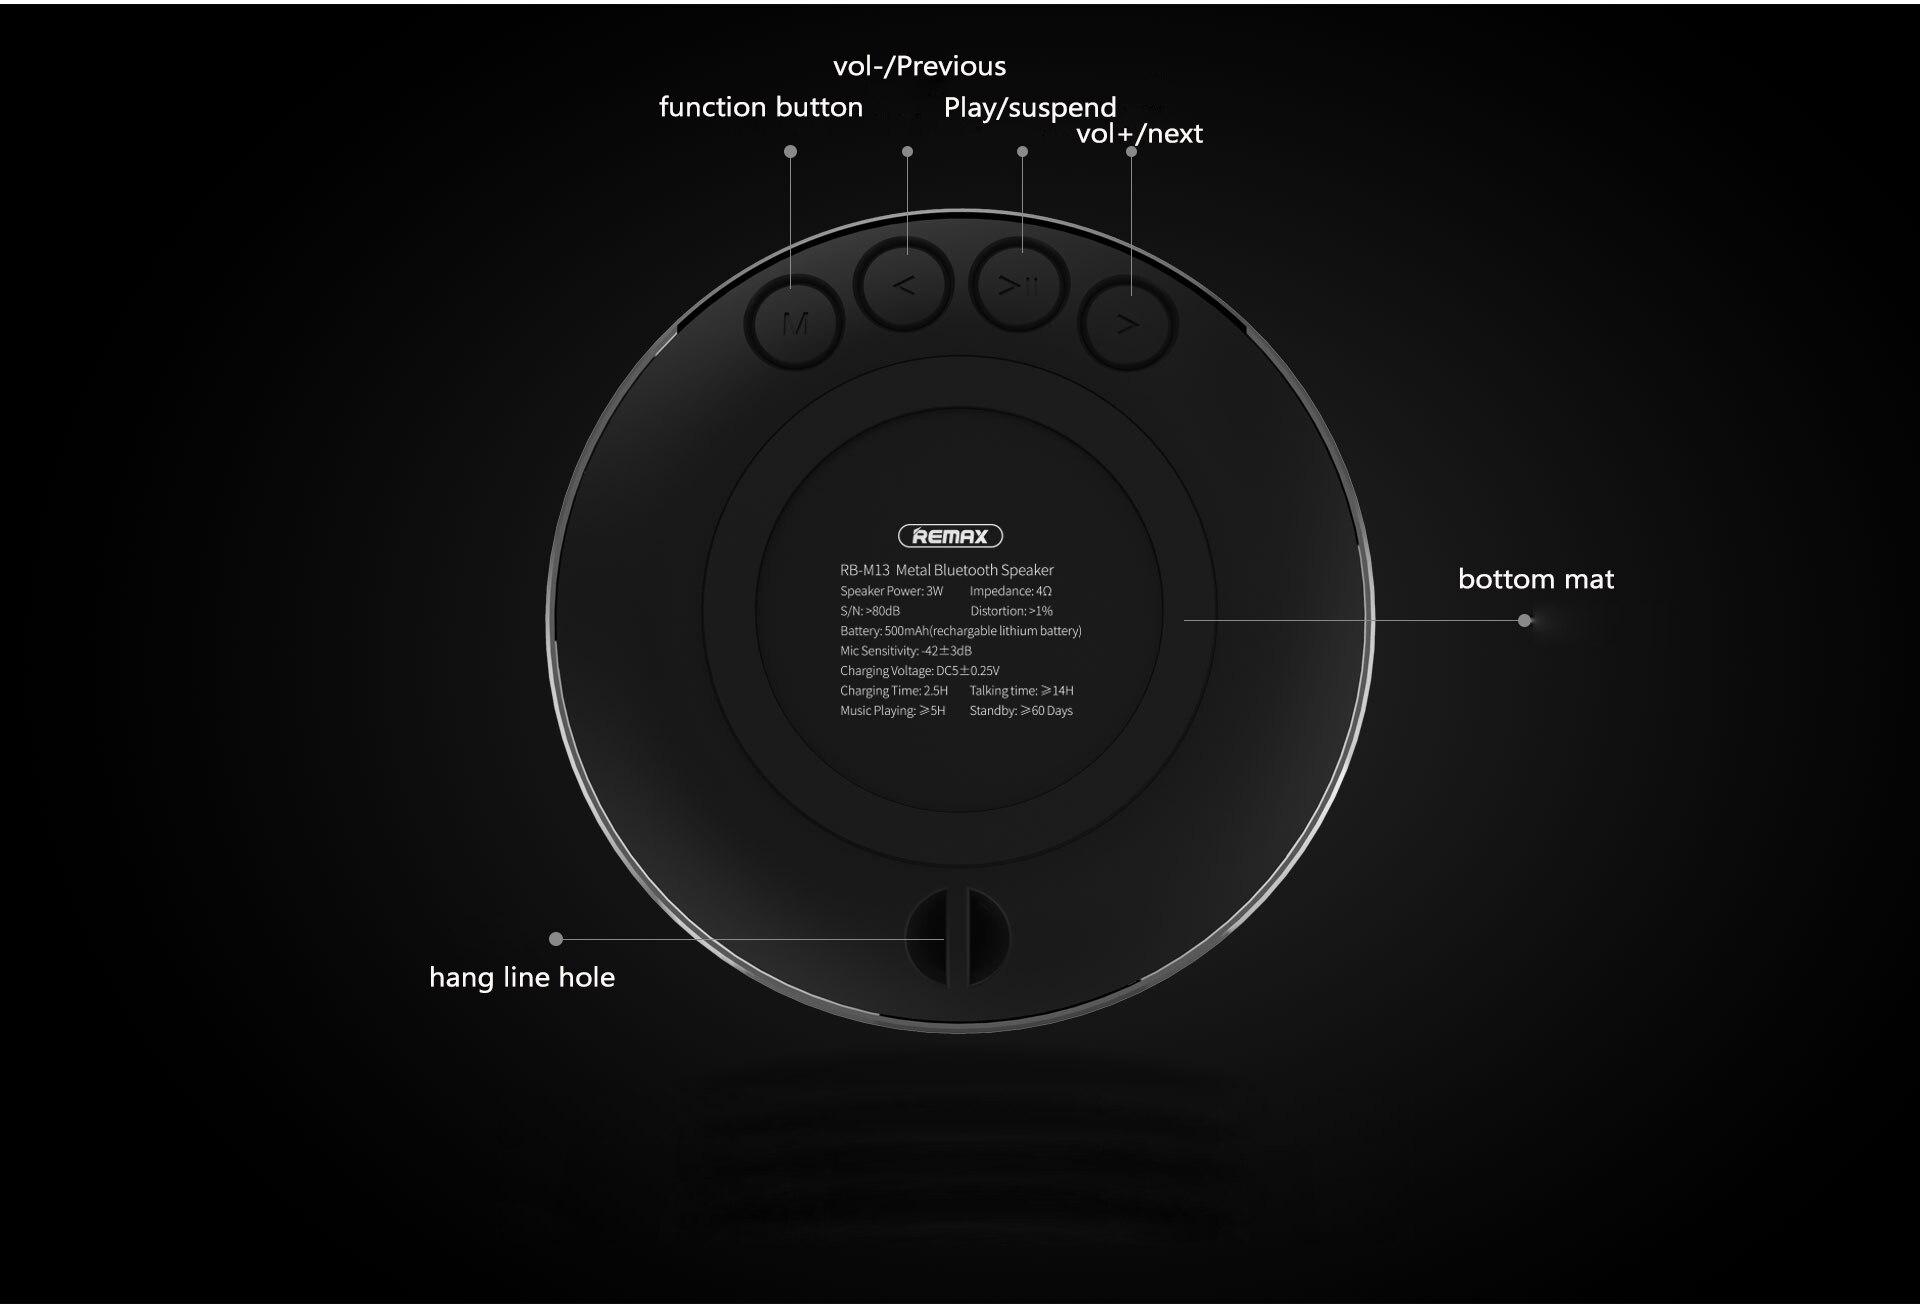 HTB1rRUvjQyWBuNjy0Fpq6yssXXa9 Remax Bluetooth Portable Speaker RB-M13 - Black